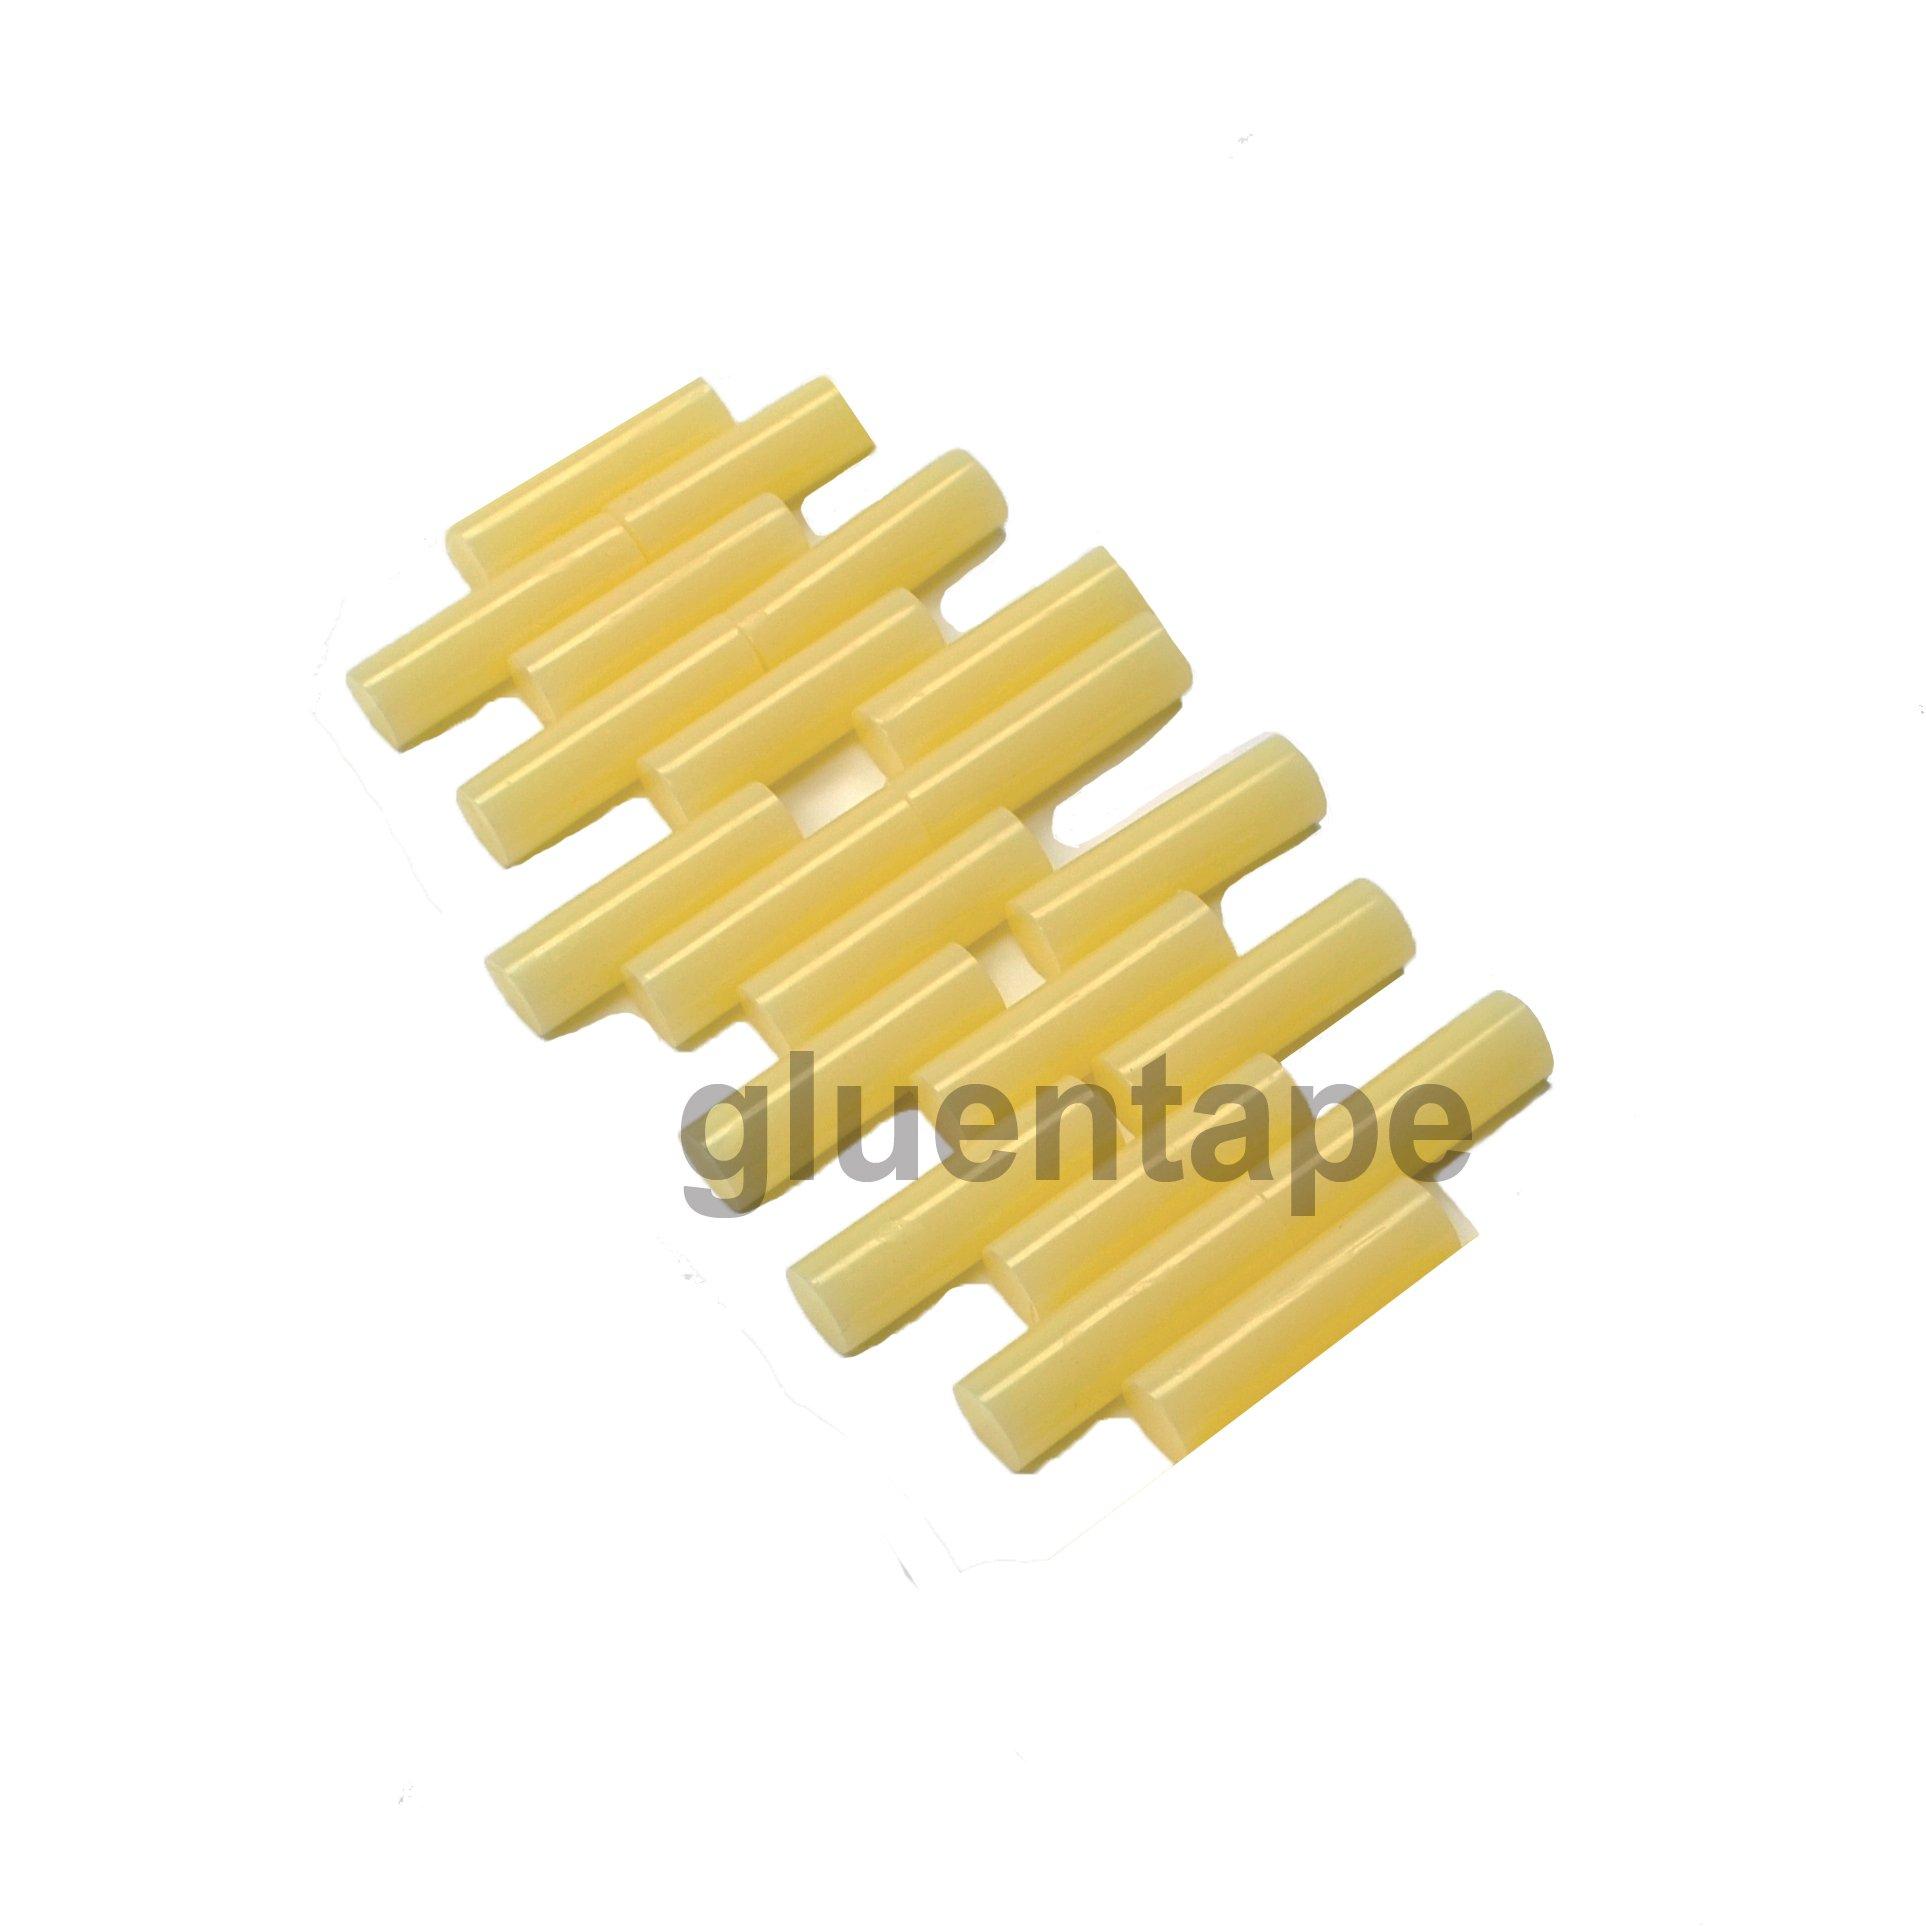 General Packaging Hot Melt Glue Stick 5/8 inch x 2 inch (25lbs) by GlueNTape